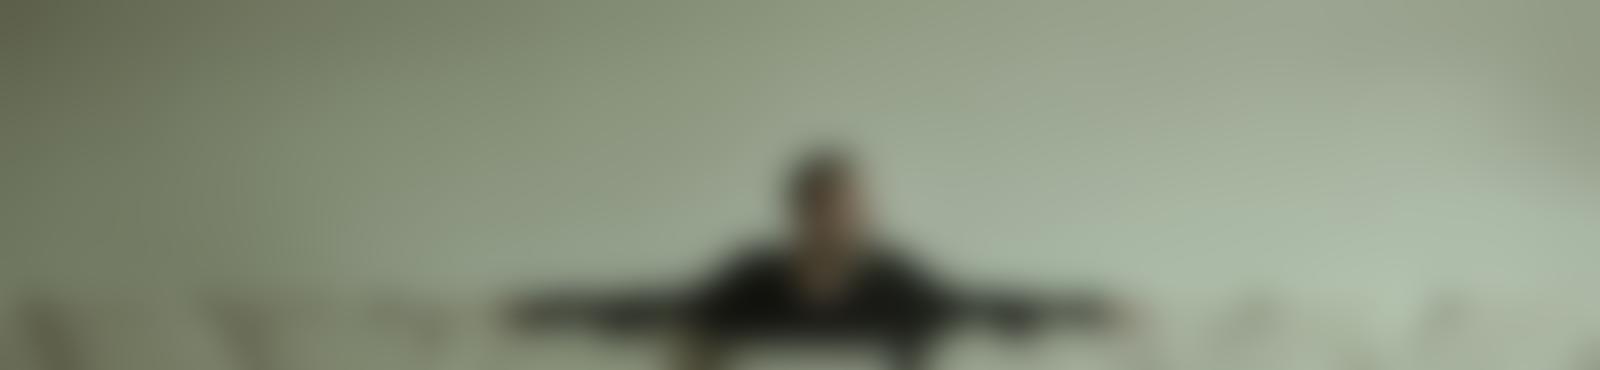 Blurred cfecdd84 6eb5 4a3f aeaa 6427a507be9e